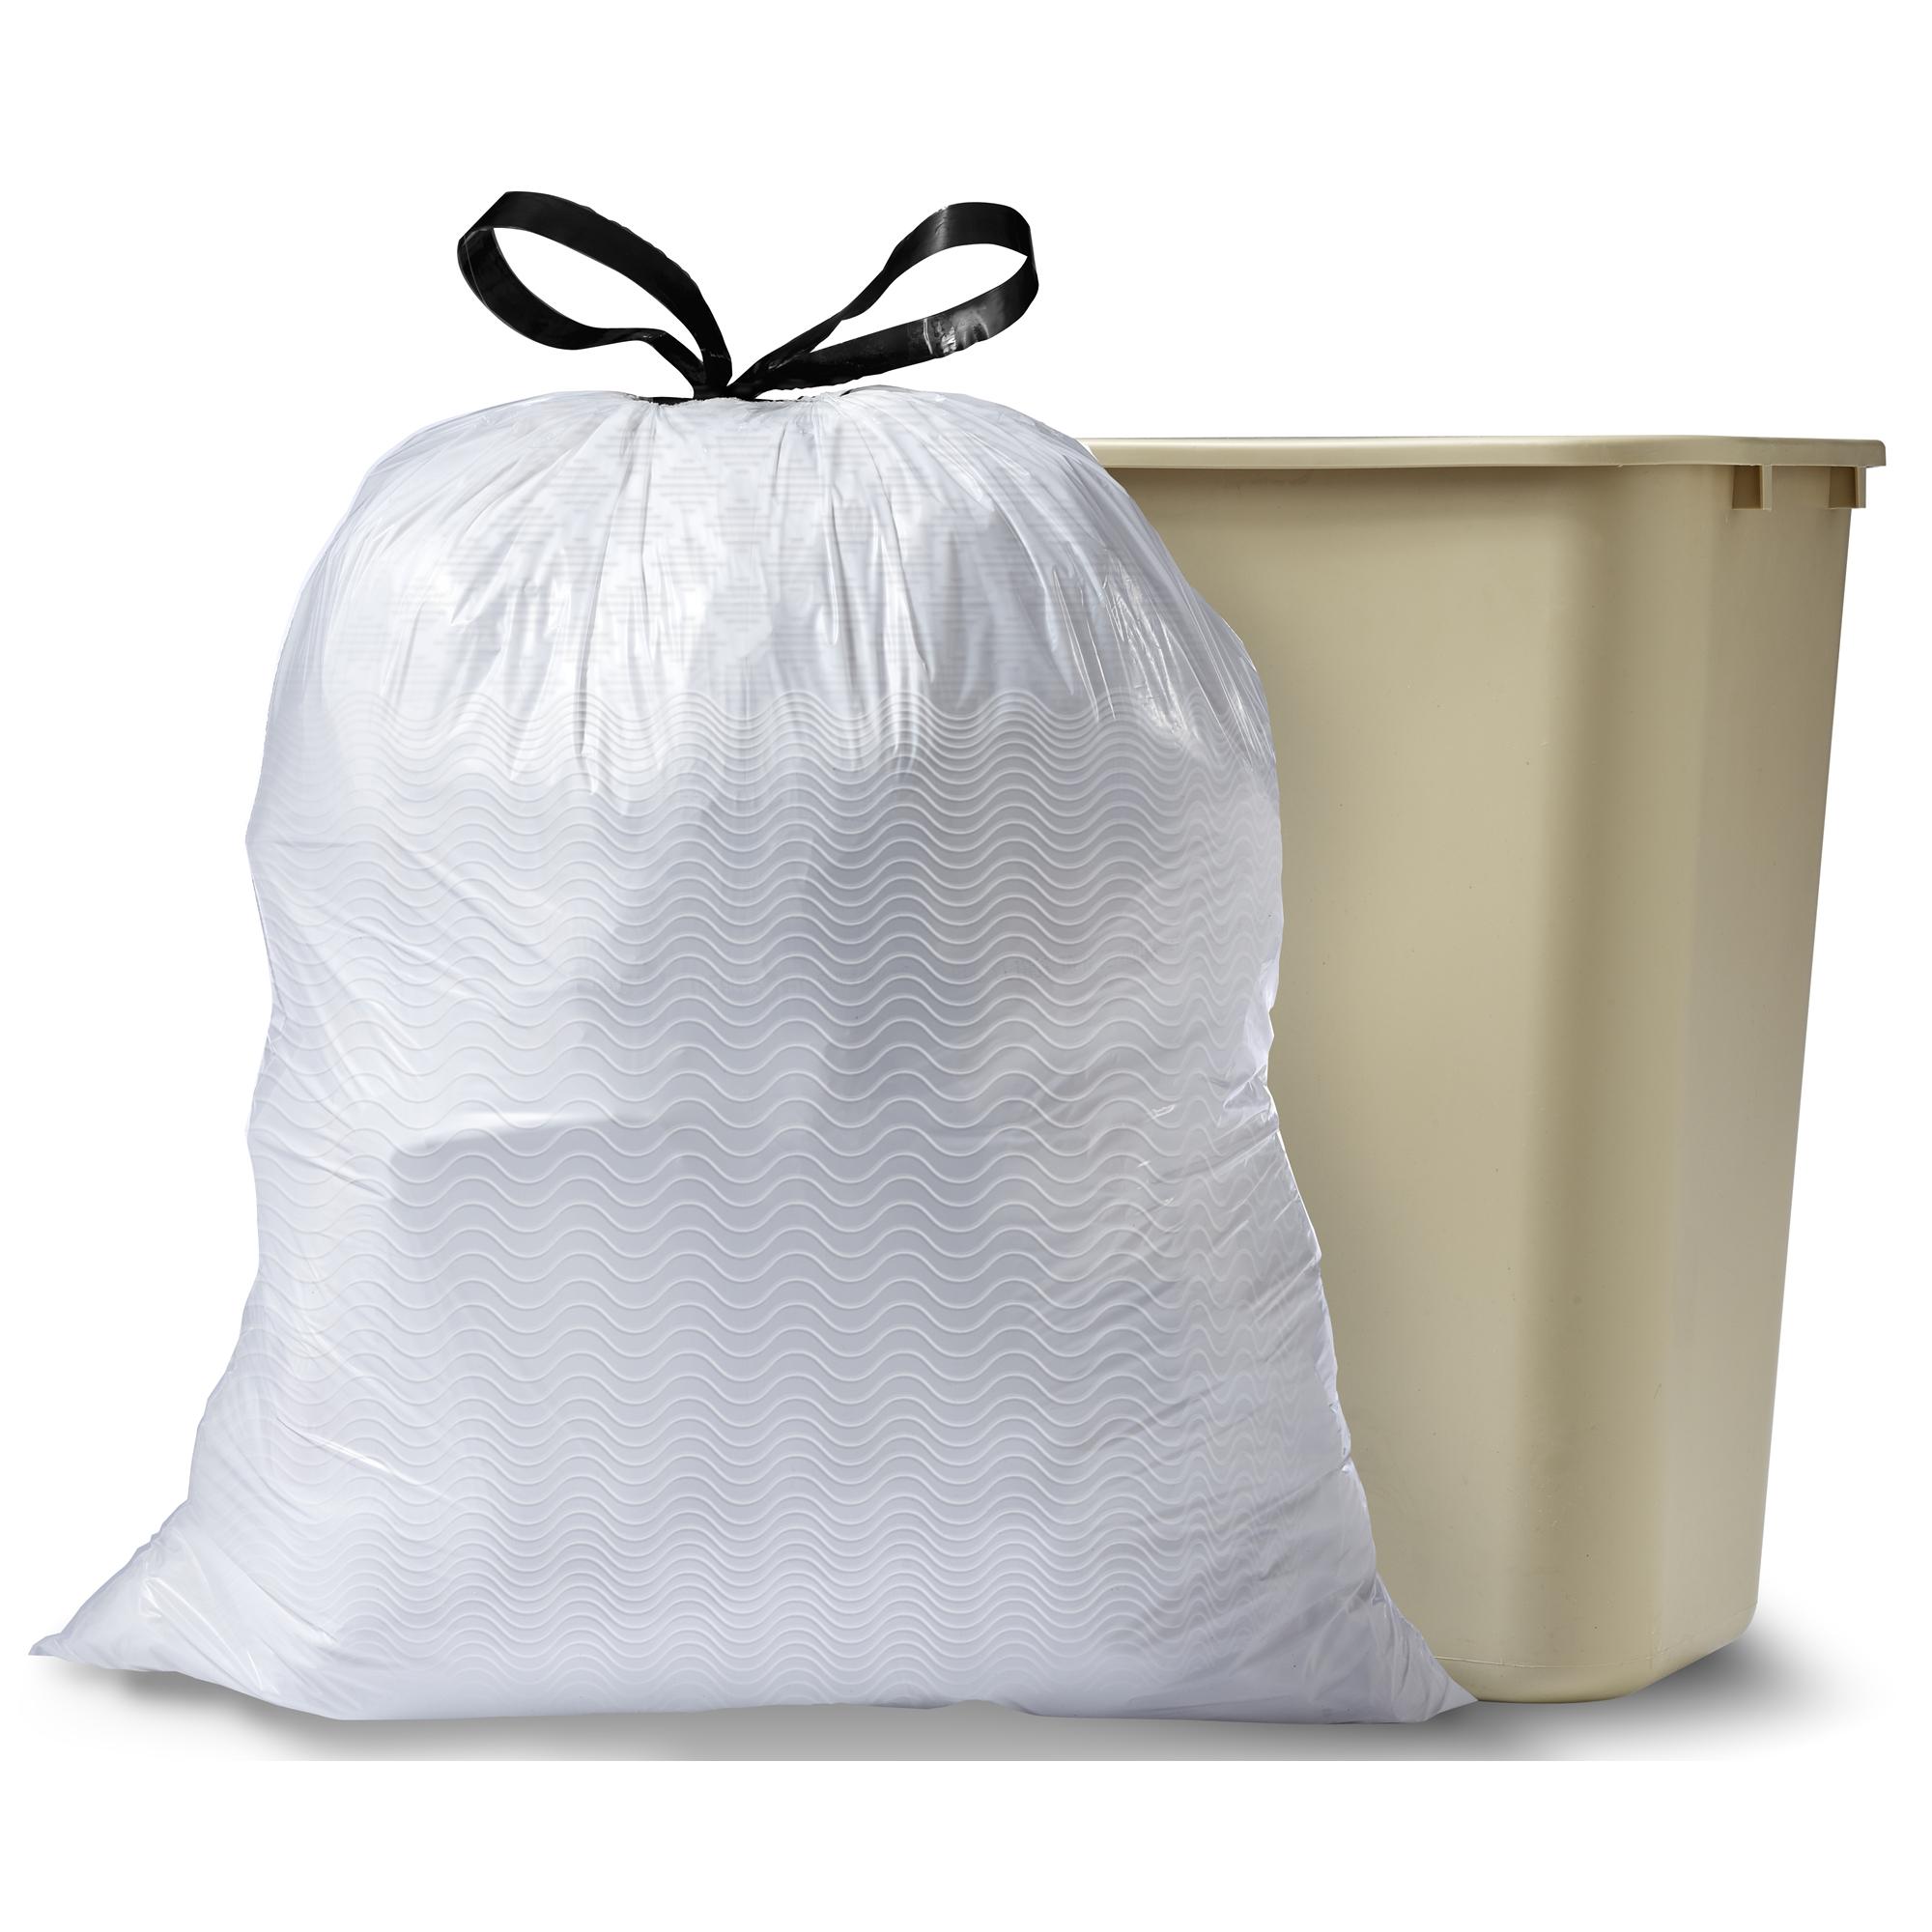 45 ct, Glad Tall Kitchen Draw string Trash Garbage Bags 13 Gallon